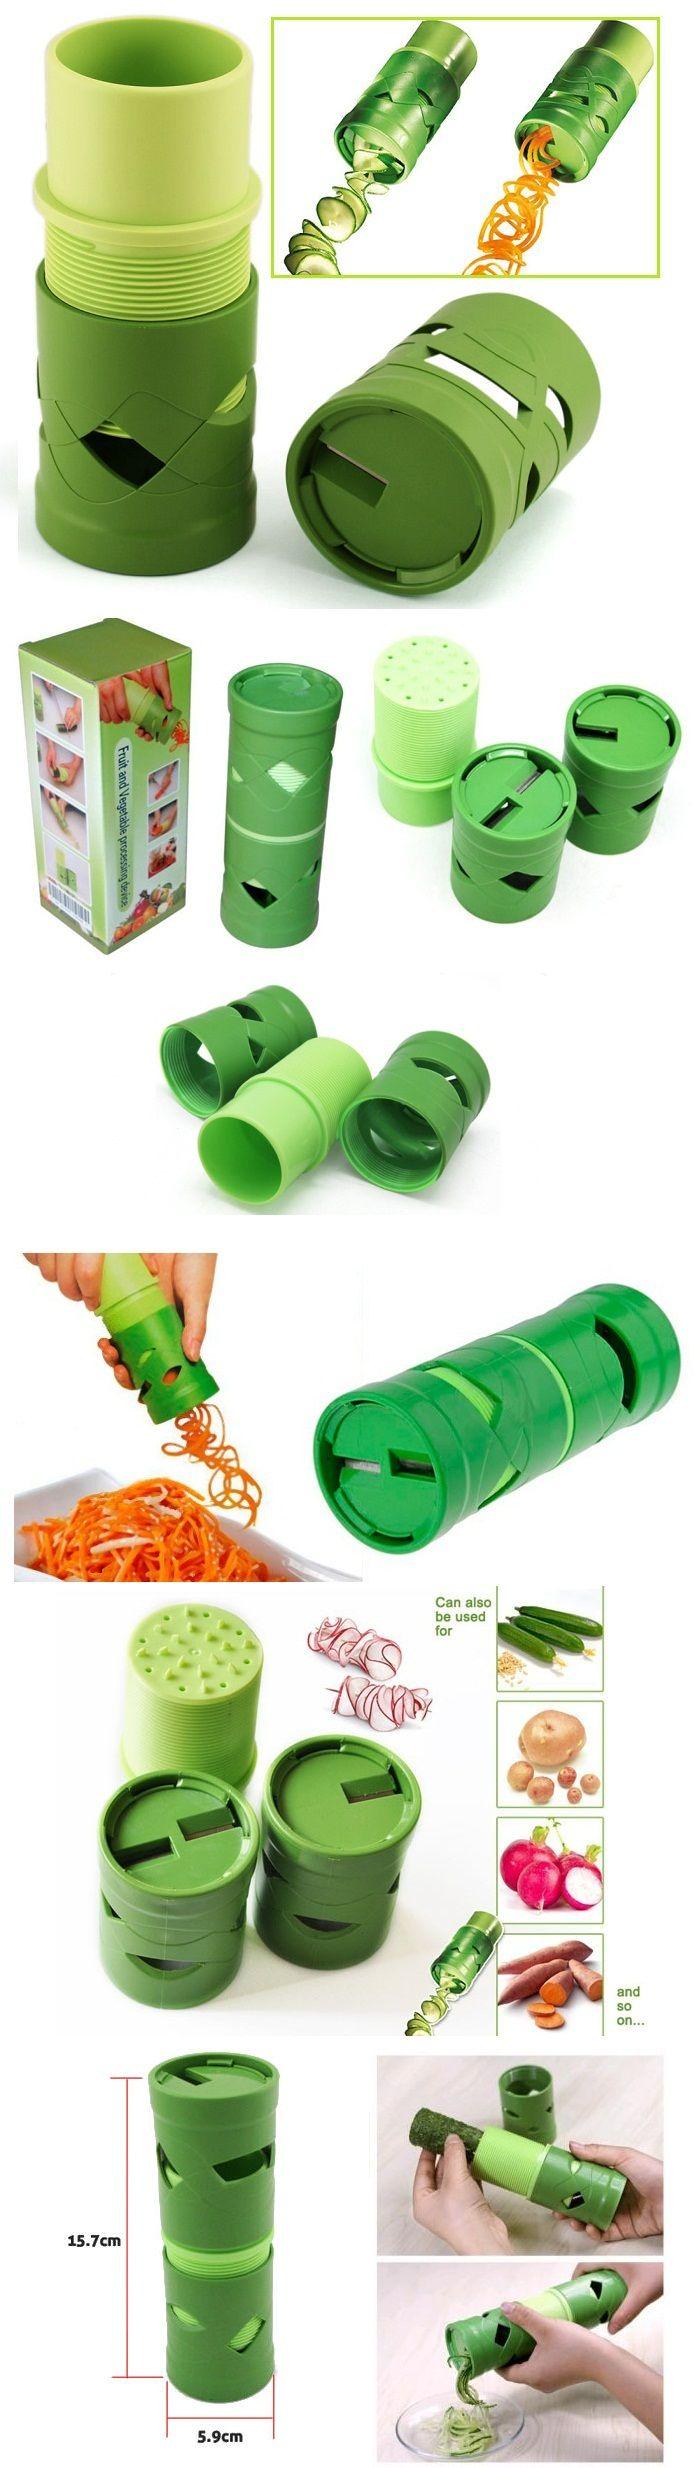 Descascador Aspiral Verduras Legumes Fatiador Cortador - R$ 16,99 no MercadoLivre